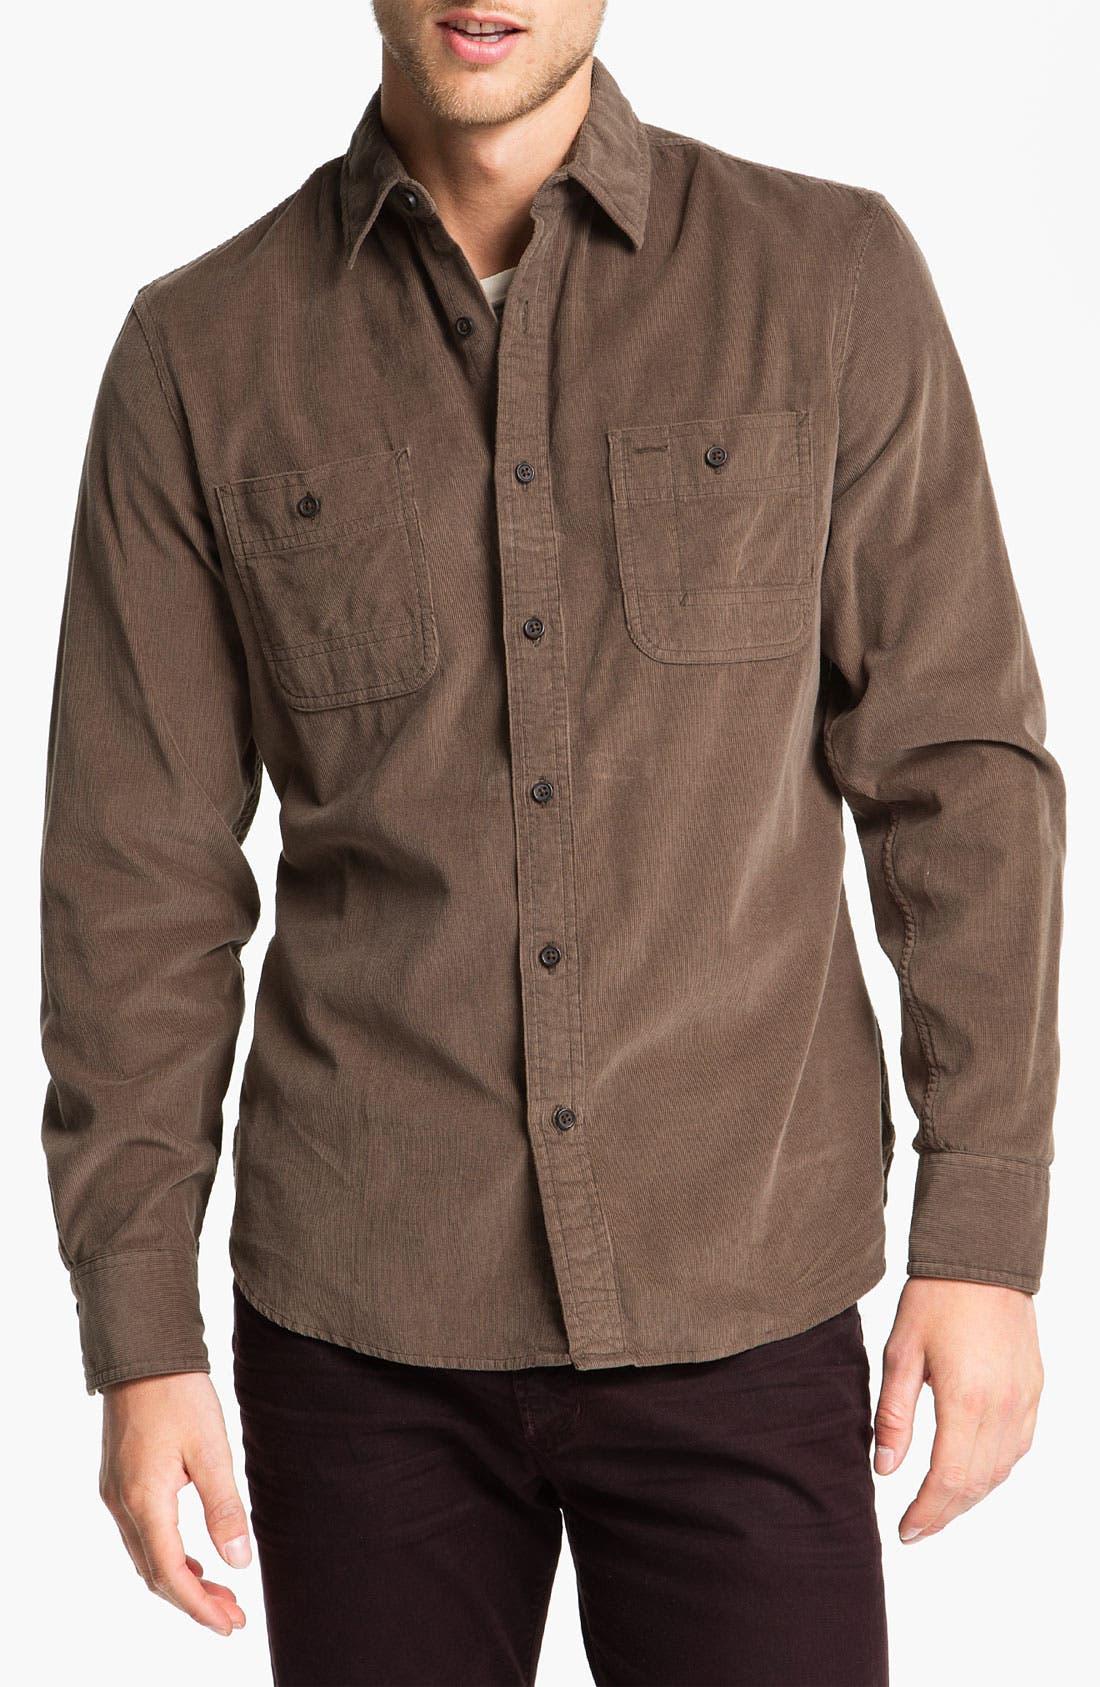 Alternate Image 1 Selected - Wallin & Bros. Corduroy Work Shirt